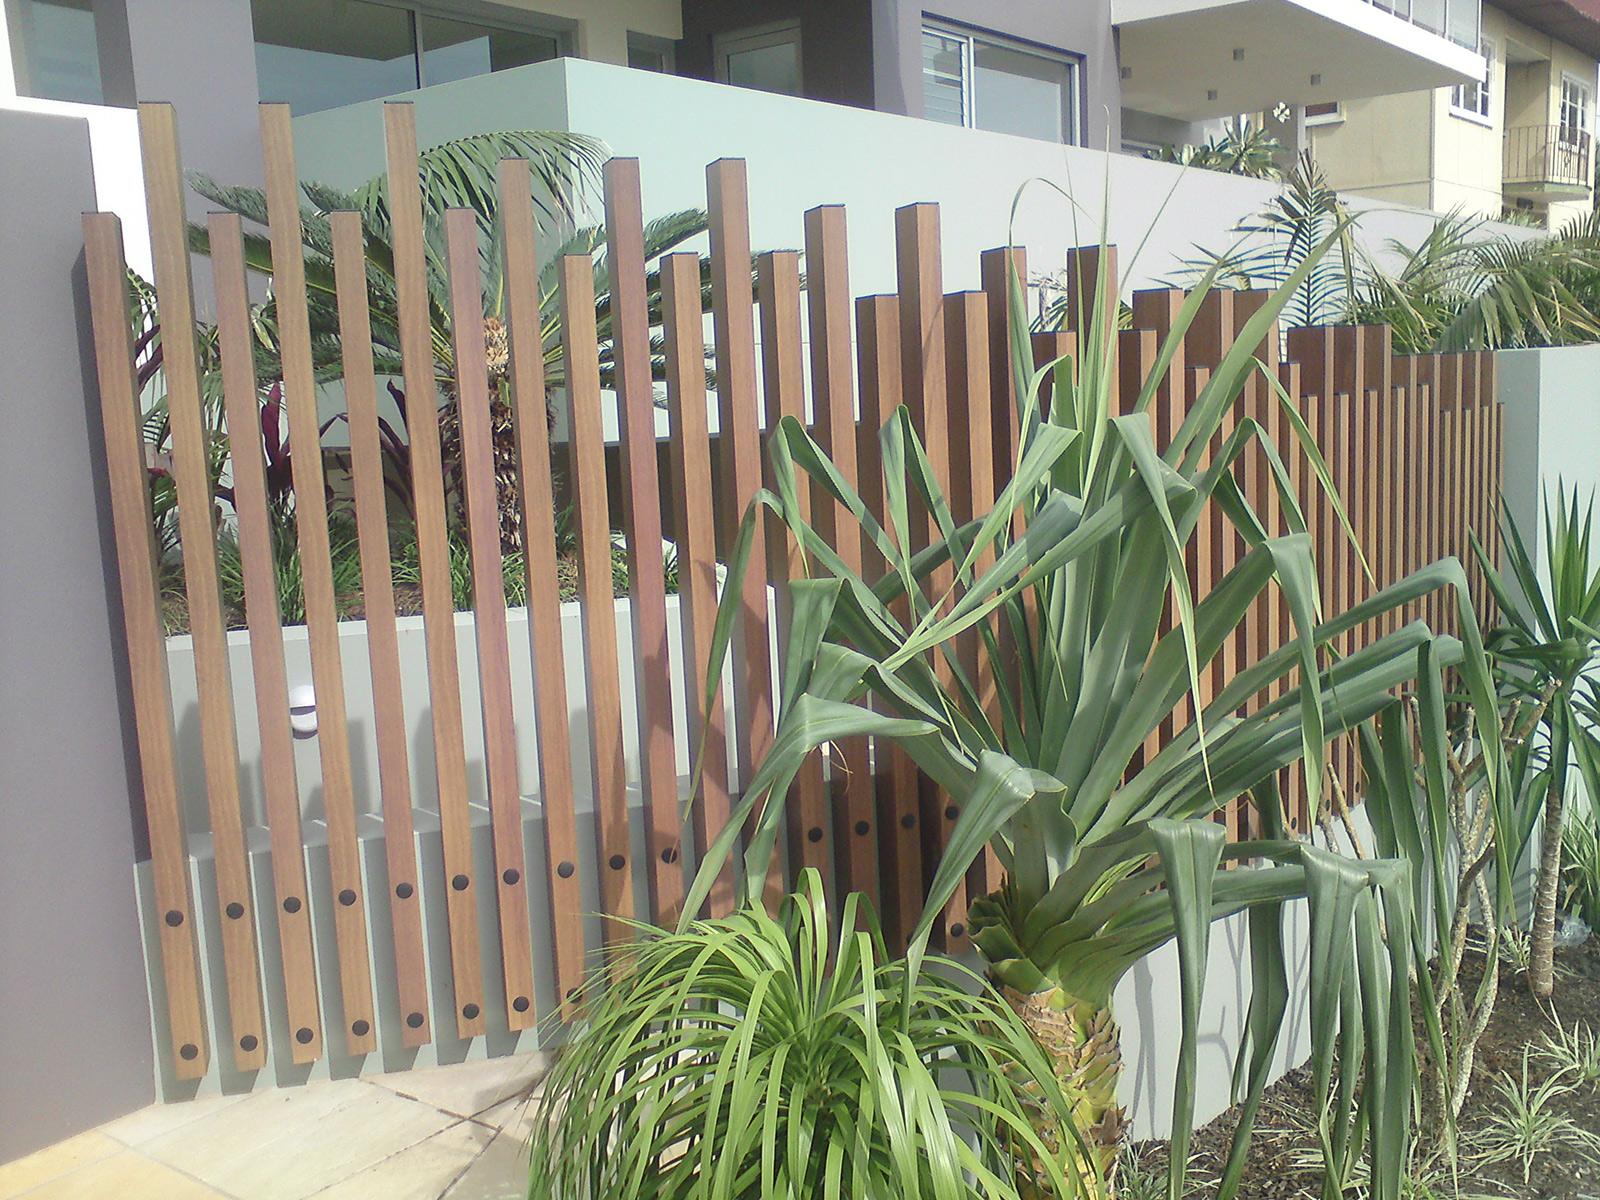 knotwood-hand-rails-lo.jpg